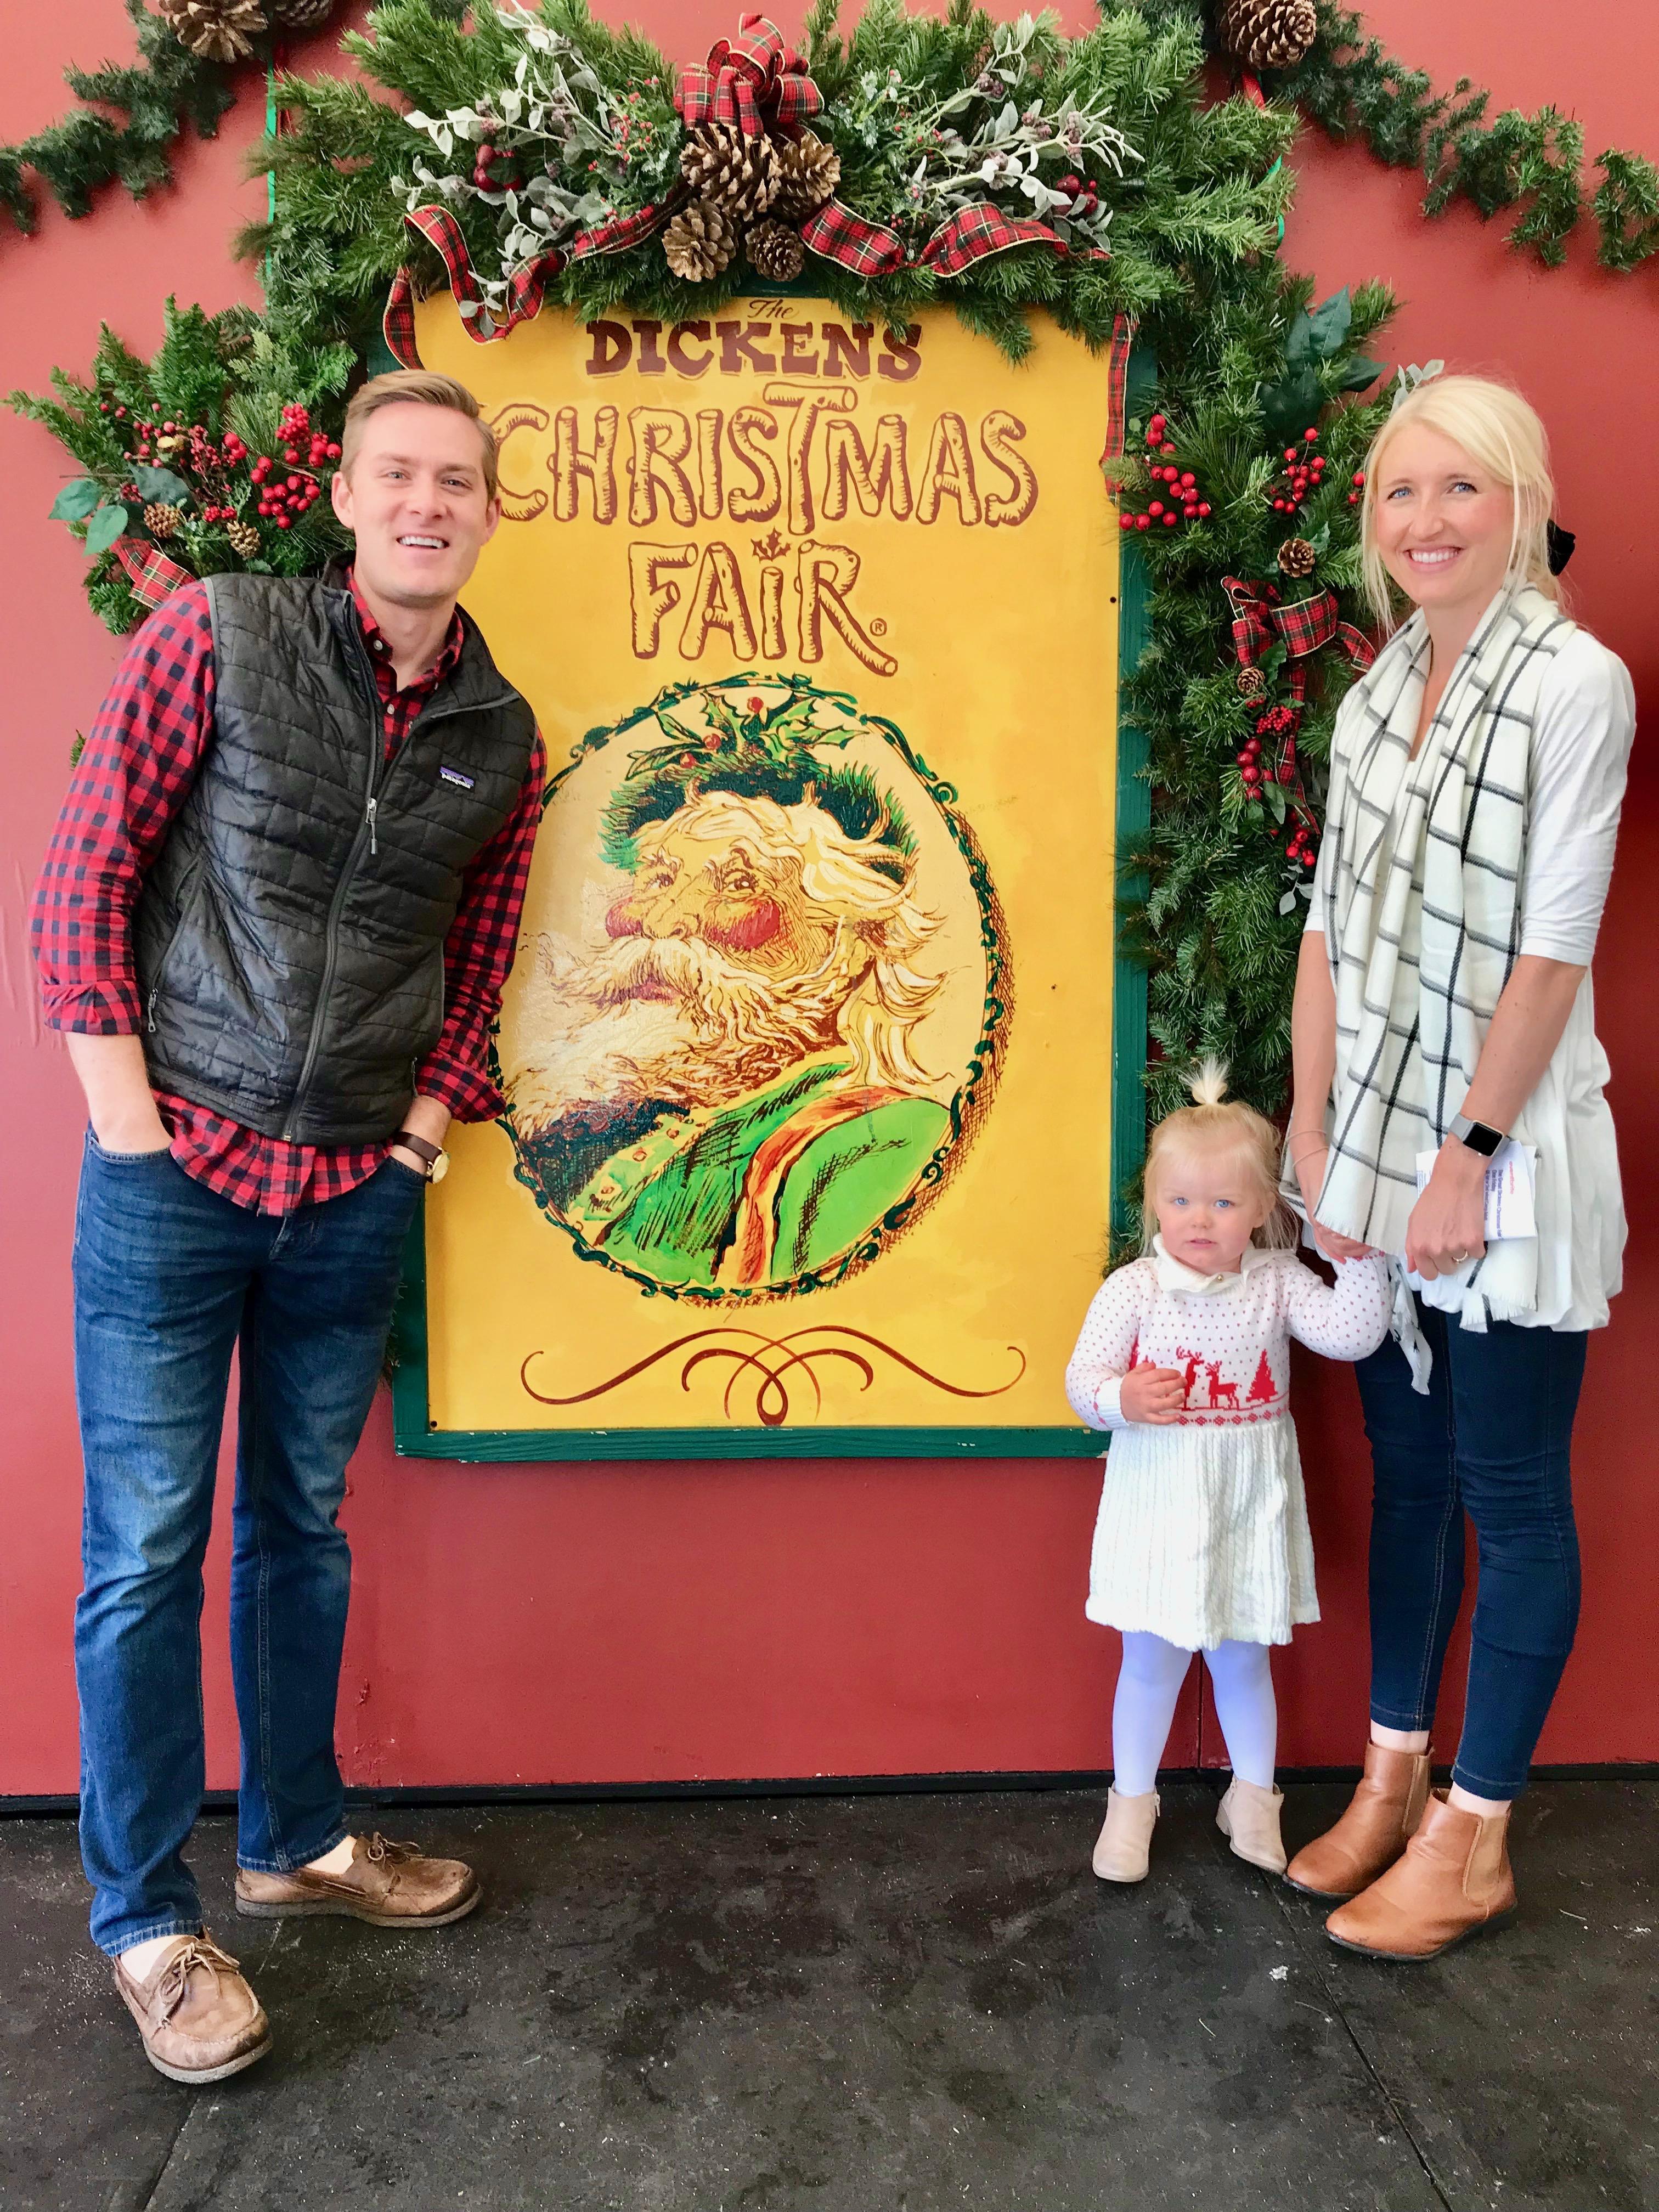 The Great Dickens Christmas Fair